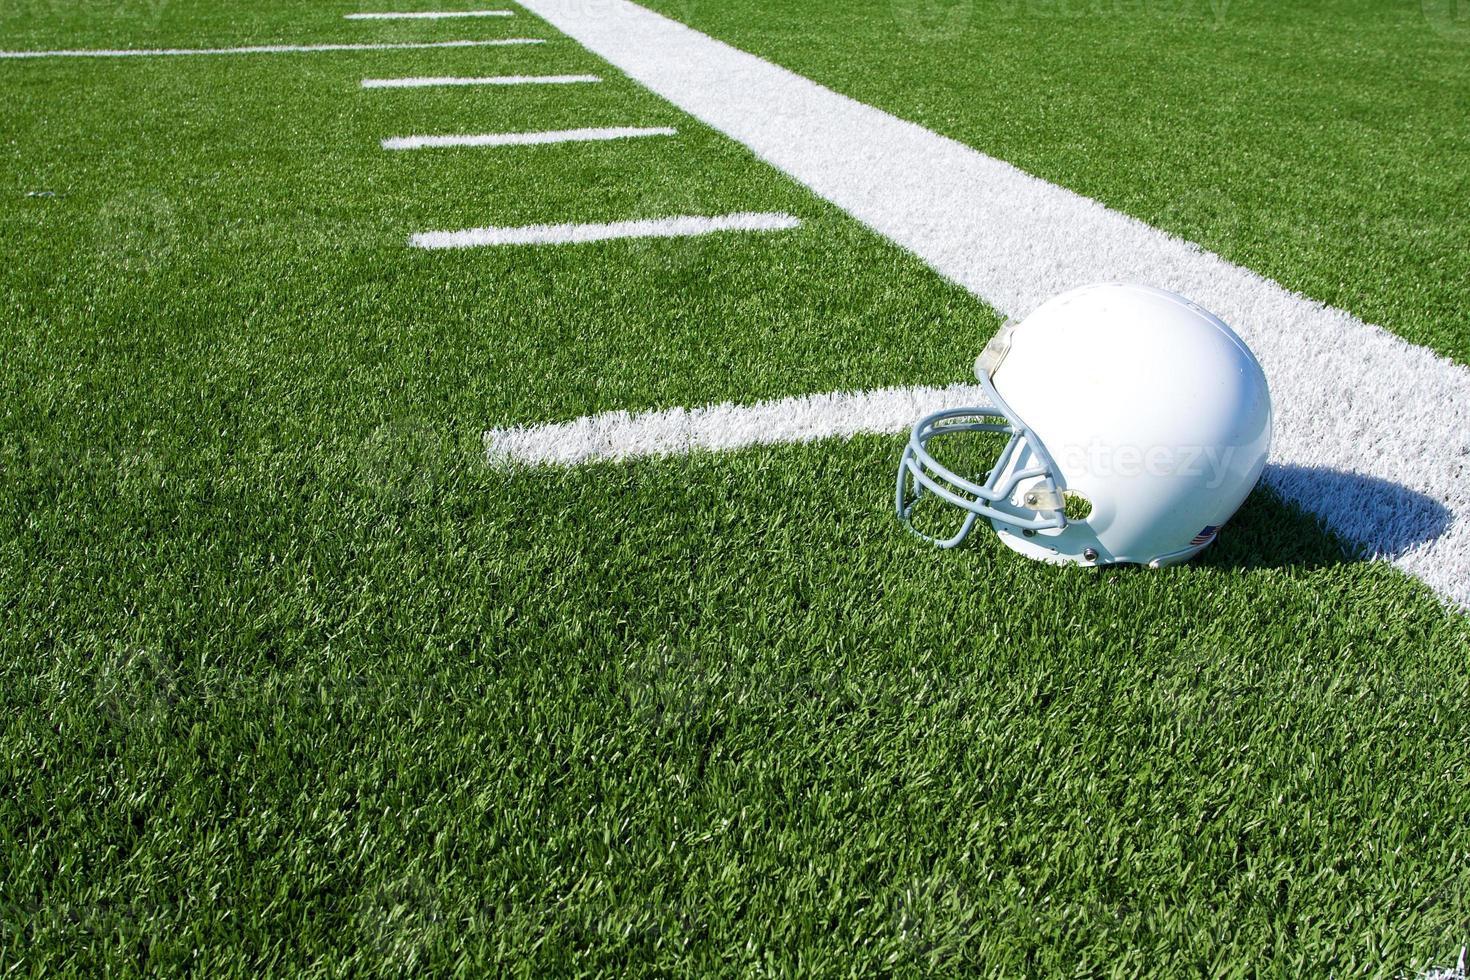 casque de football américain sur le terrain photo